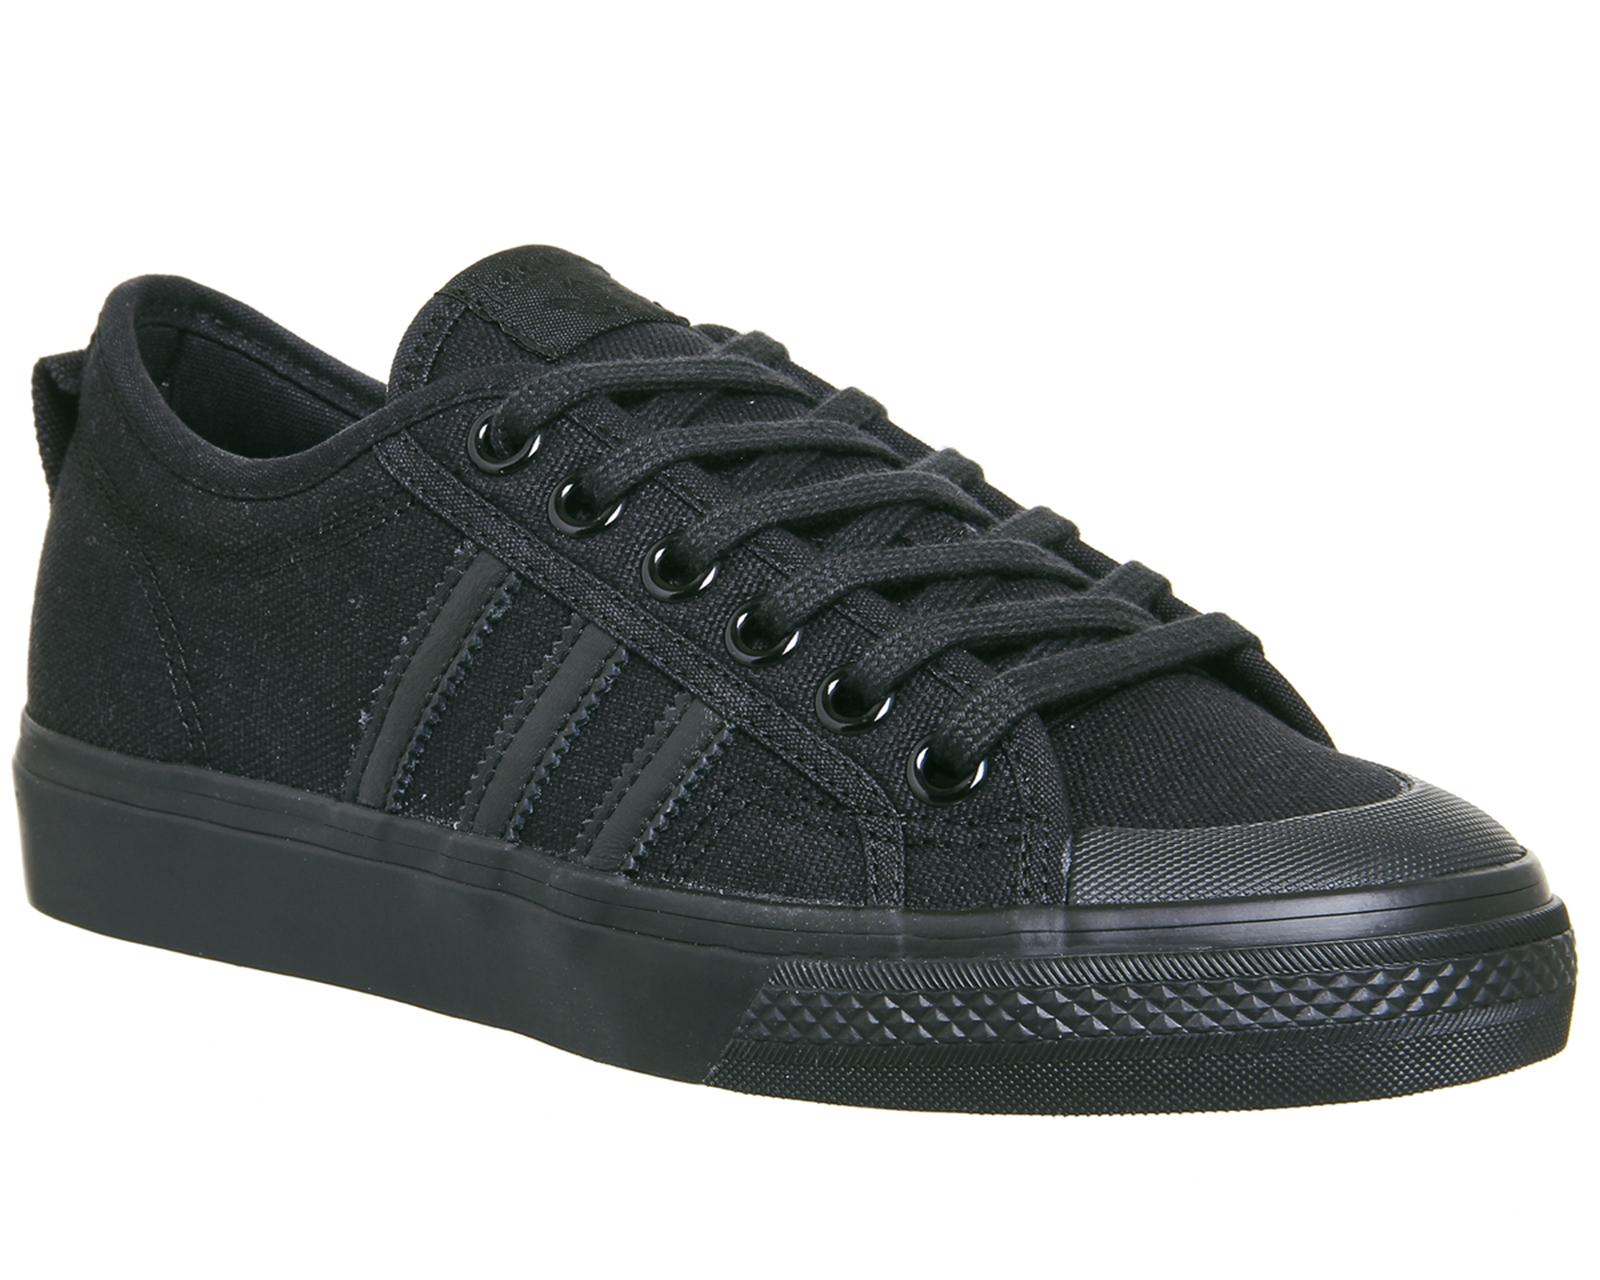 Mens Adidas Nizza Trainers BLACK MONO Trainers Schuhes